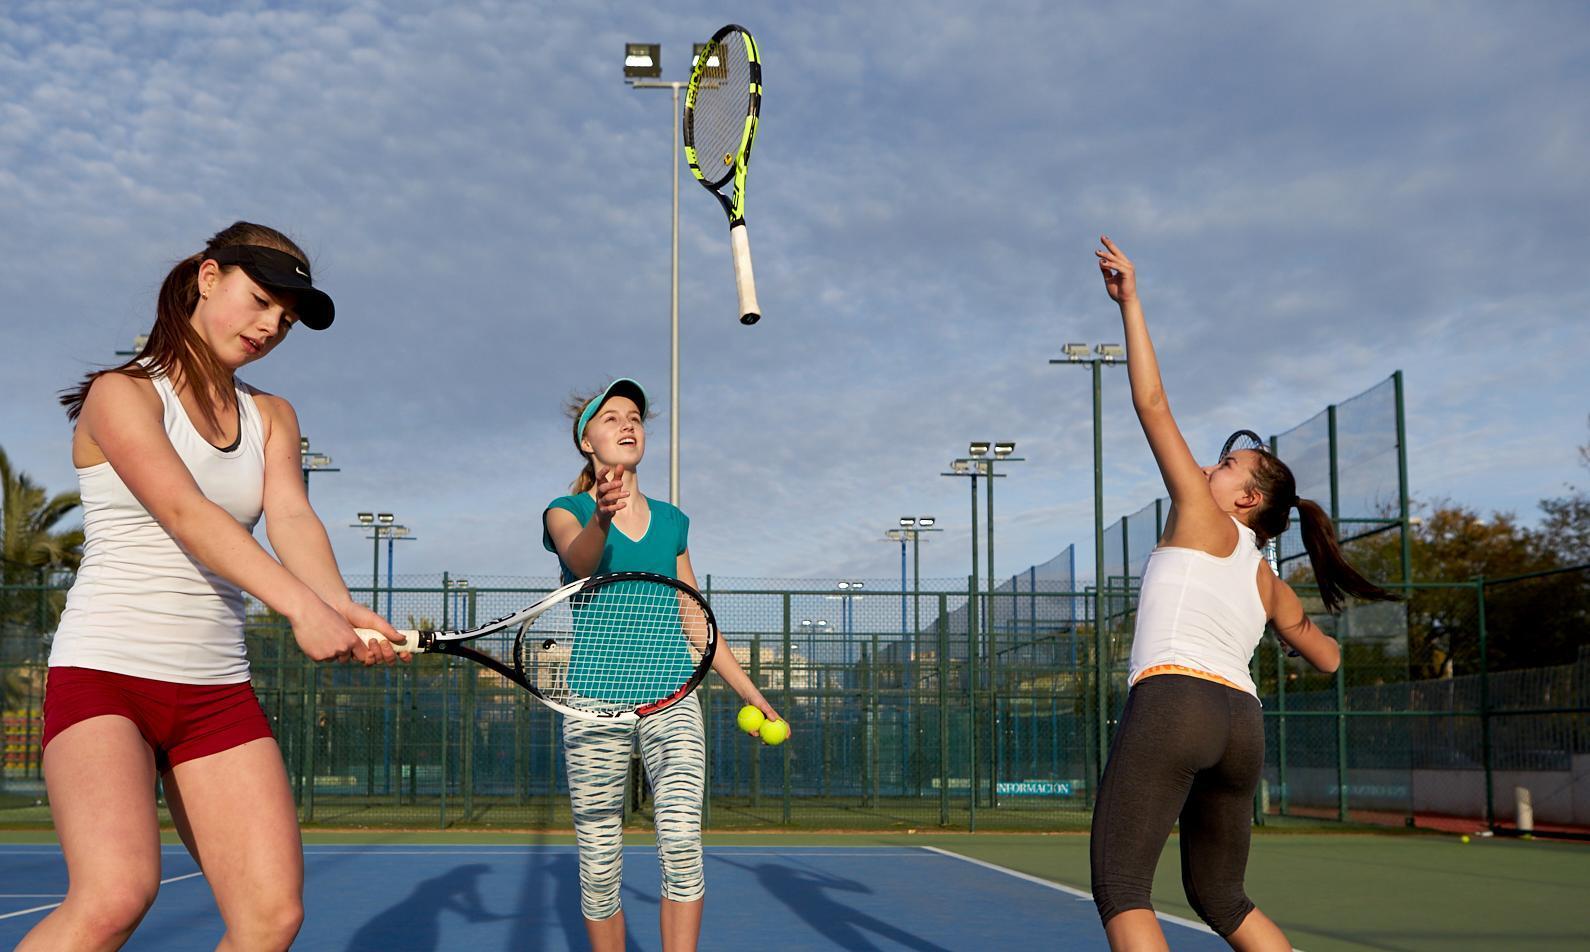 96d4dc9d Flere skal spille mer tennis og de skal spille hele livet